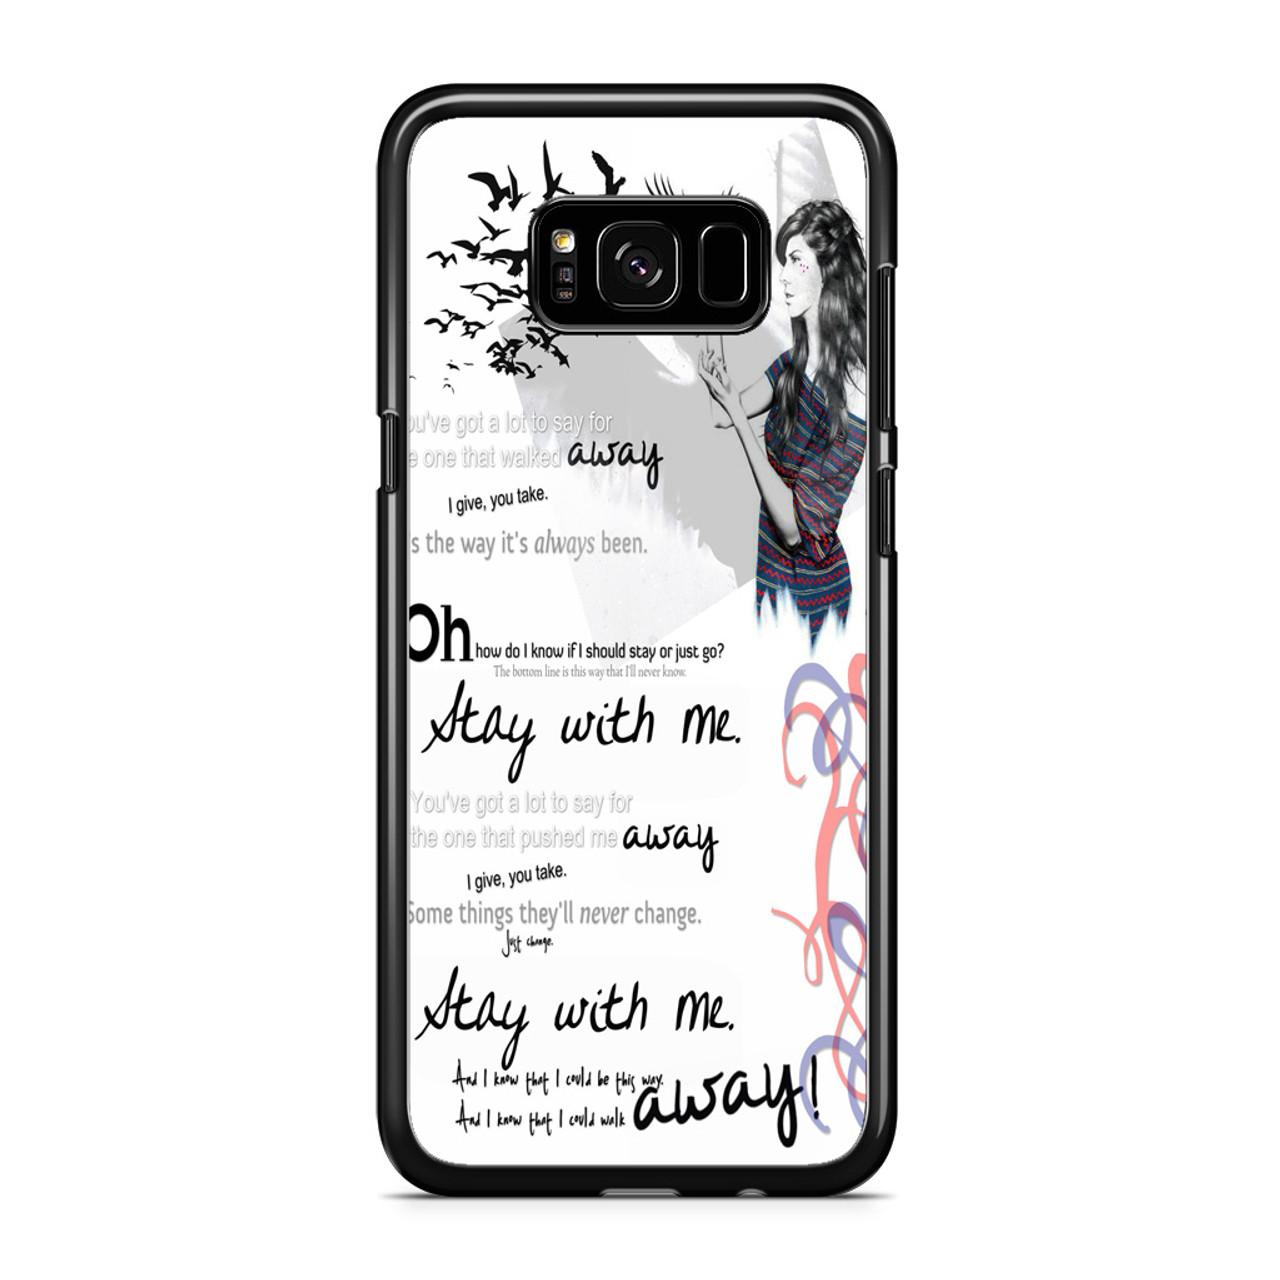 Stay With Me Sam Smith Lyrics Art Samsung Galaxy S8 Case